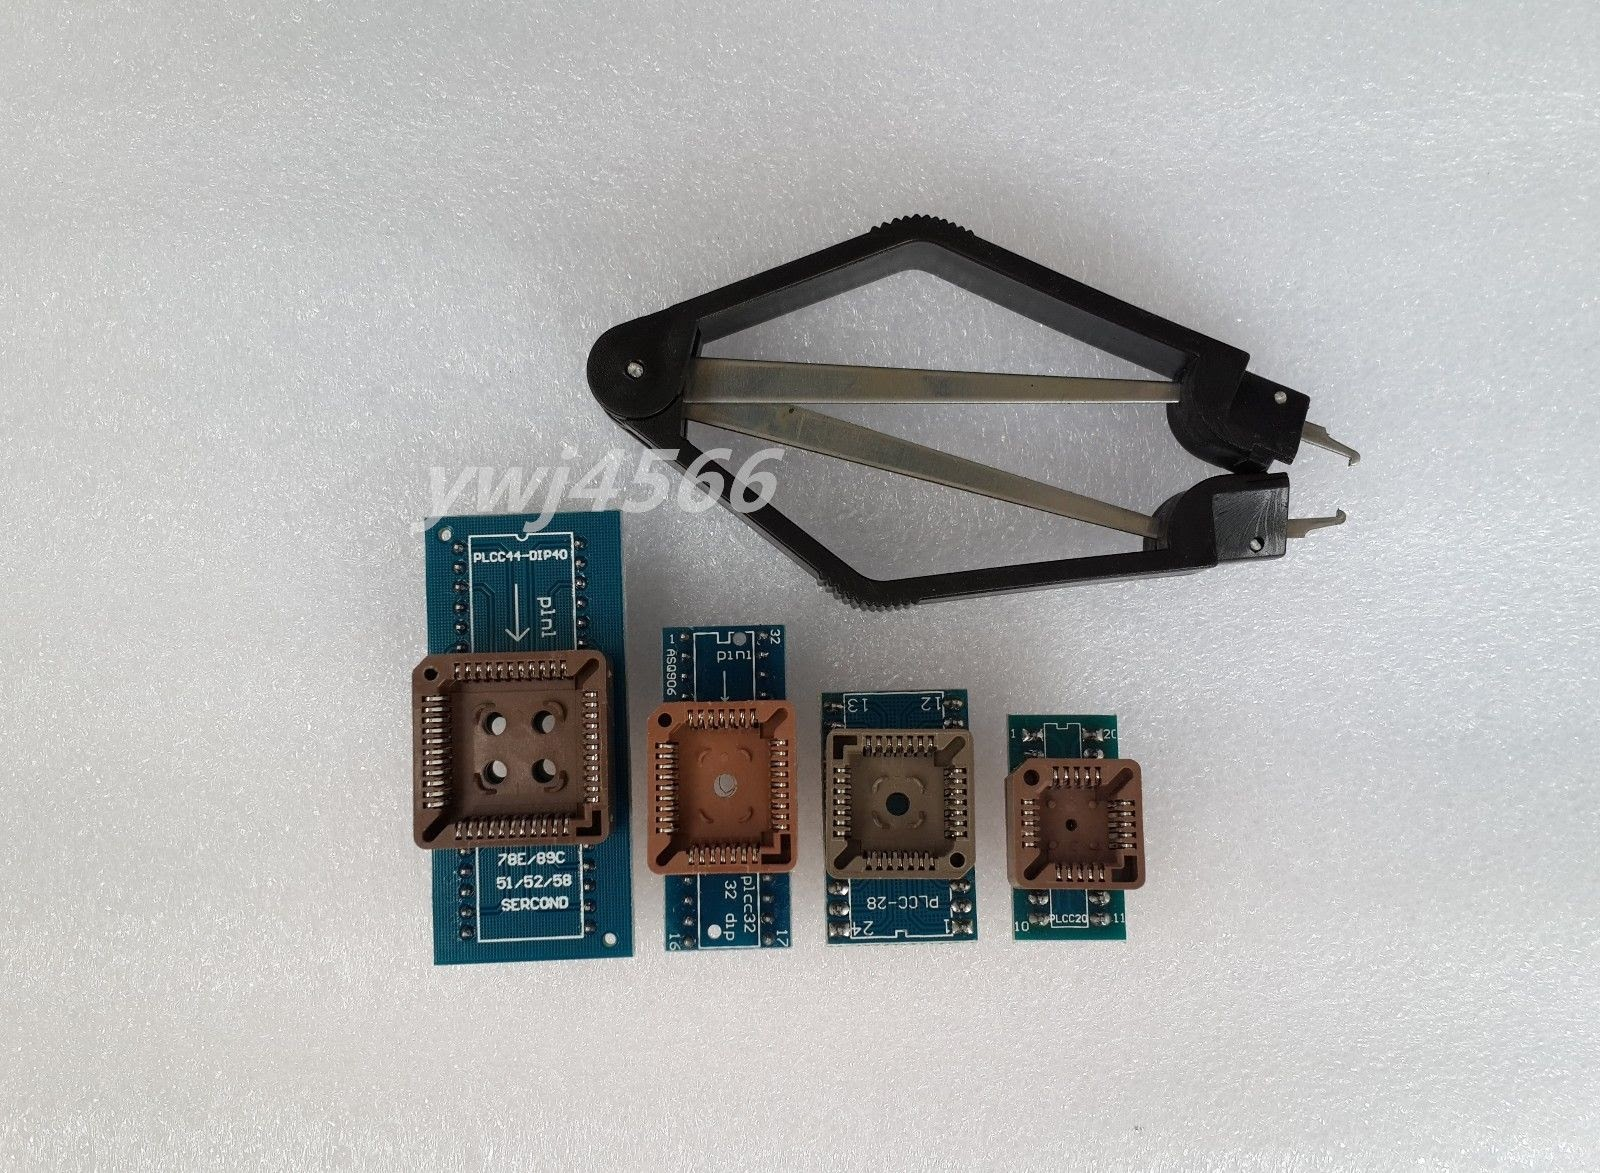 Oh Soic8 Sop8 Tes Ic Flash Chip Bios Adpter Klip Soket 24 25 93 Jepit Test Clip Eeprom Rom Soic Sop Programer Adapter 1 X Plcc32 Dip32 Sop16 Msop8 Tssop8